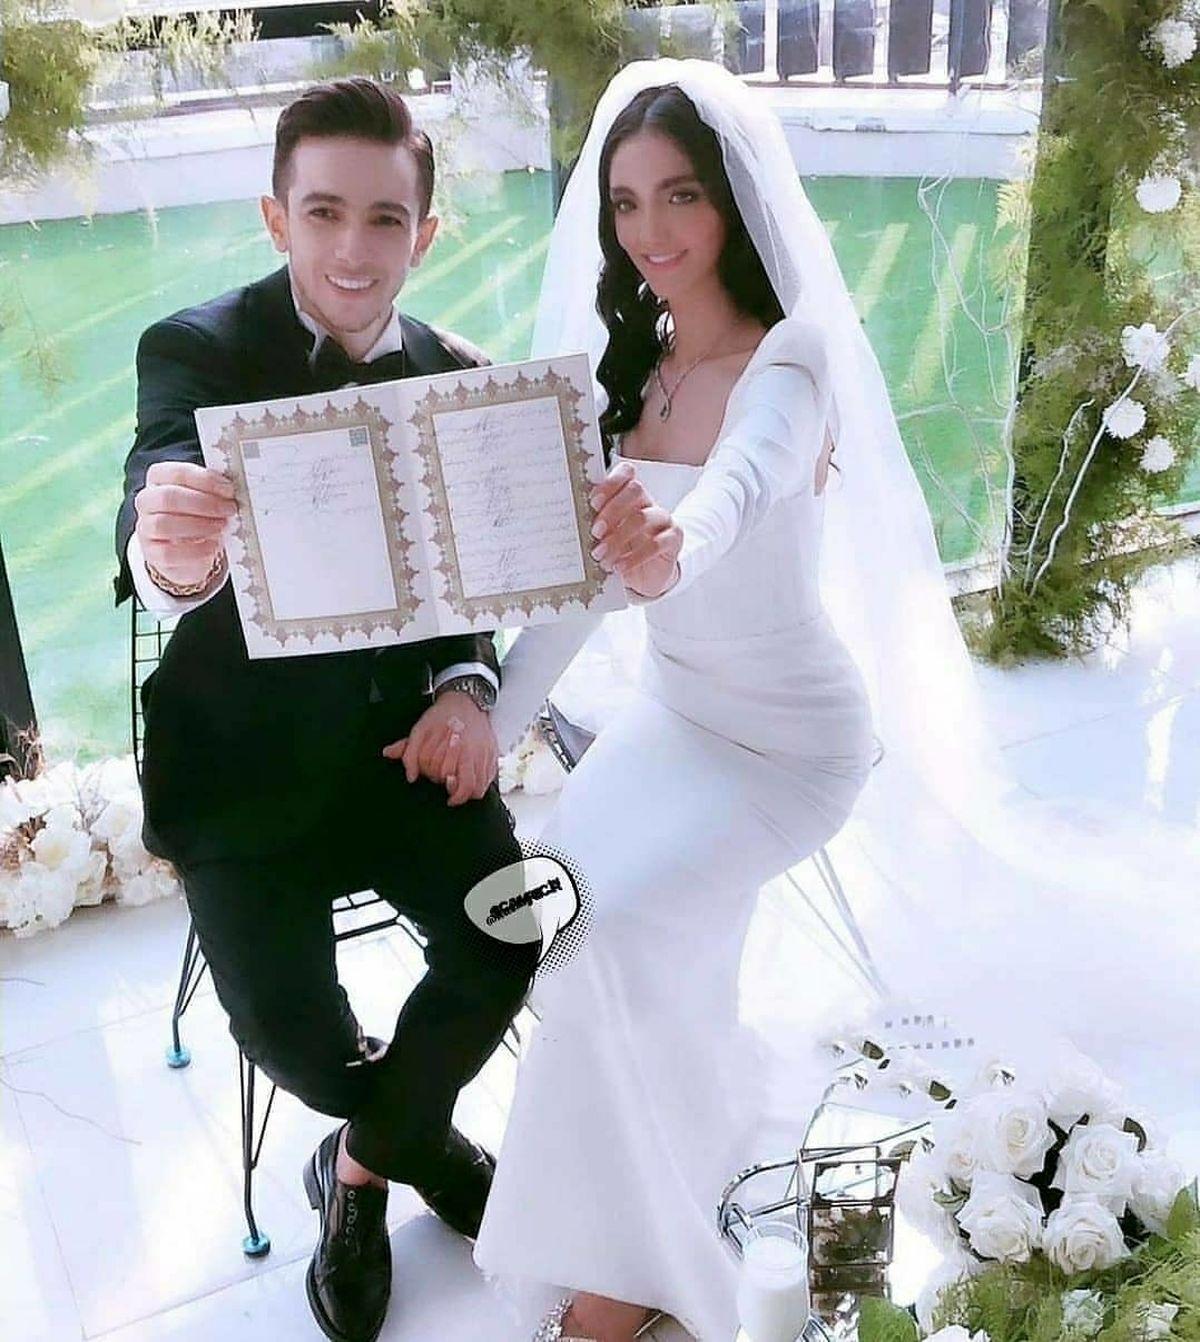 فرشاد احمدزاده فوتبالیست مشهور ازدواج کرد + عکس همسرش